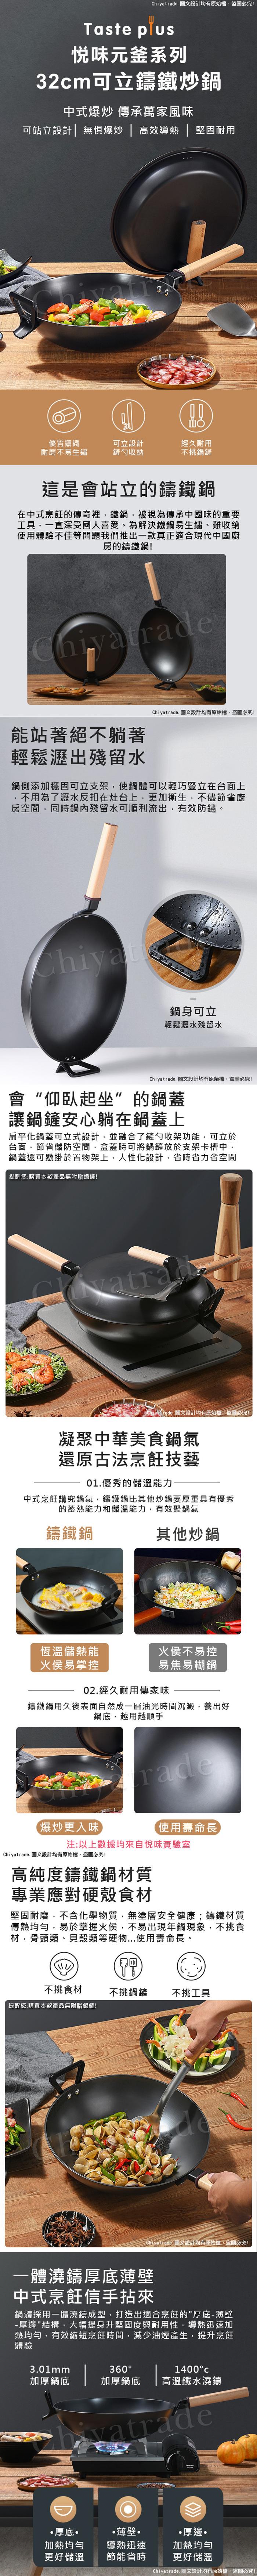 Taste Plus|悅味元器 窒化鐵鍋 鑄鐵鍋 中華炒鍋 32cm IH全對應設計(附可立式鍋蓋+鏟勺收納)